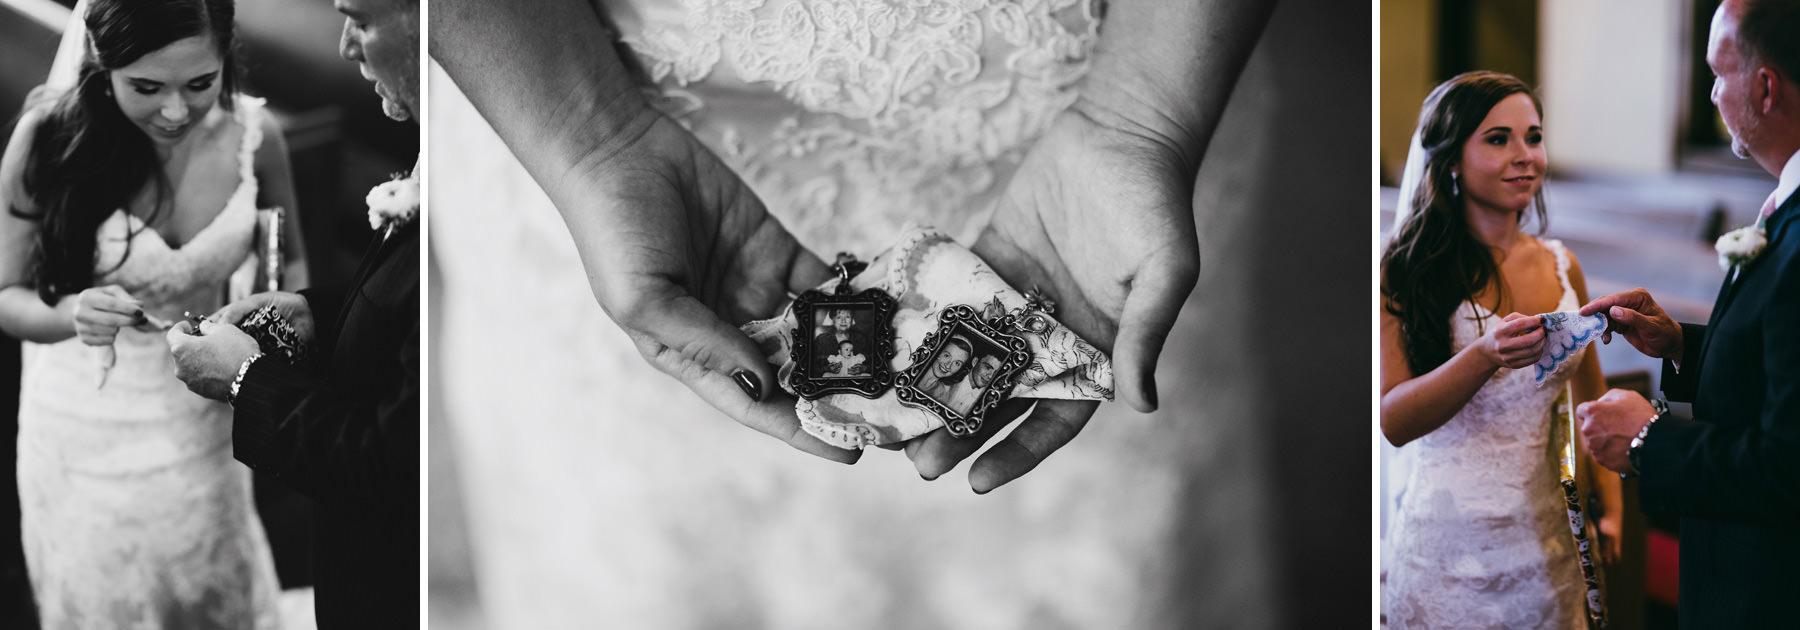 Kansas City Summer Wedding at the Guild_Kindling Wedding Photography Blog46.JPG